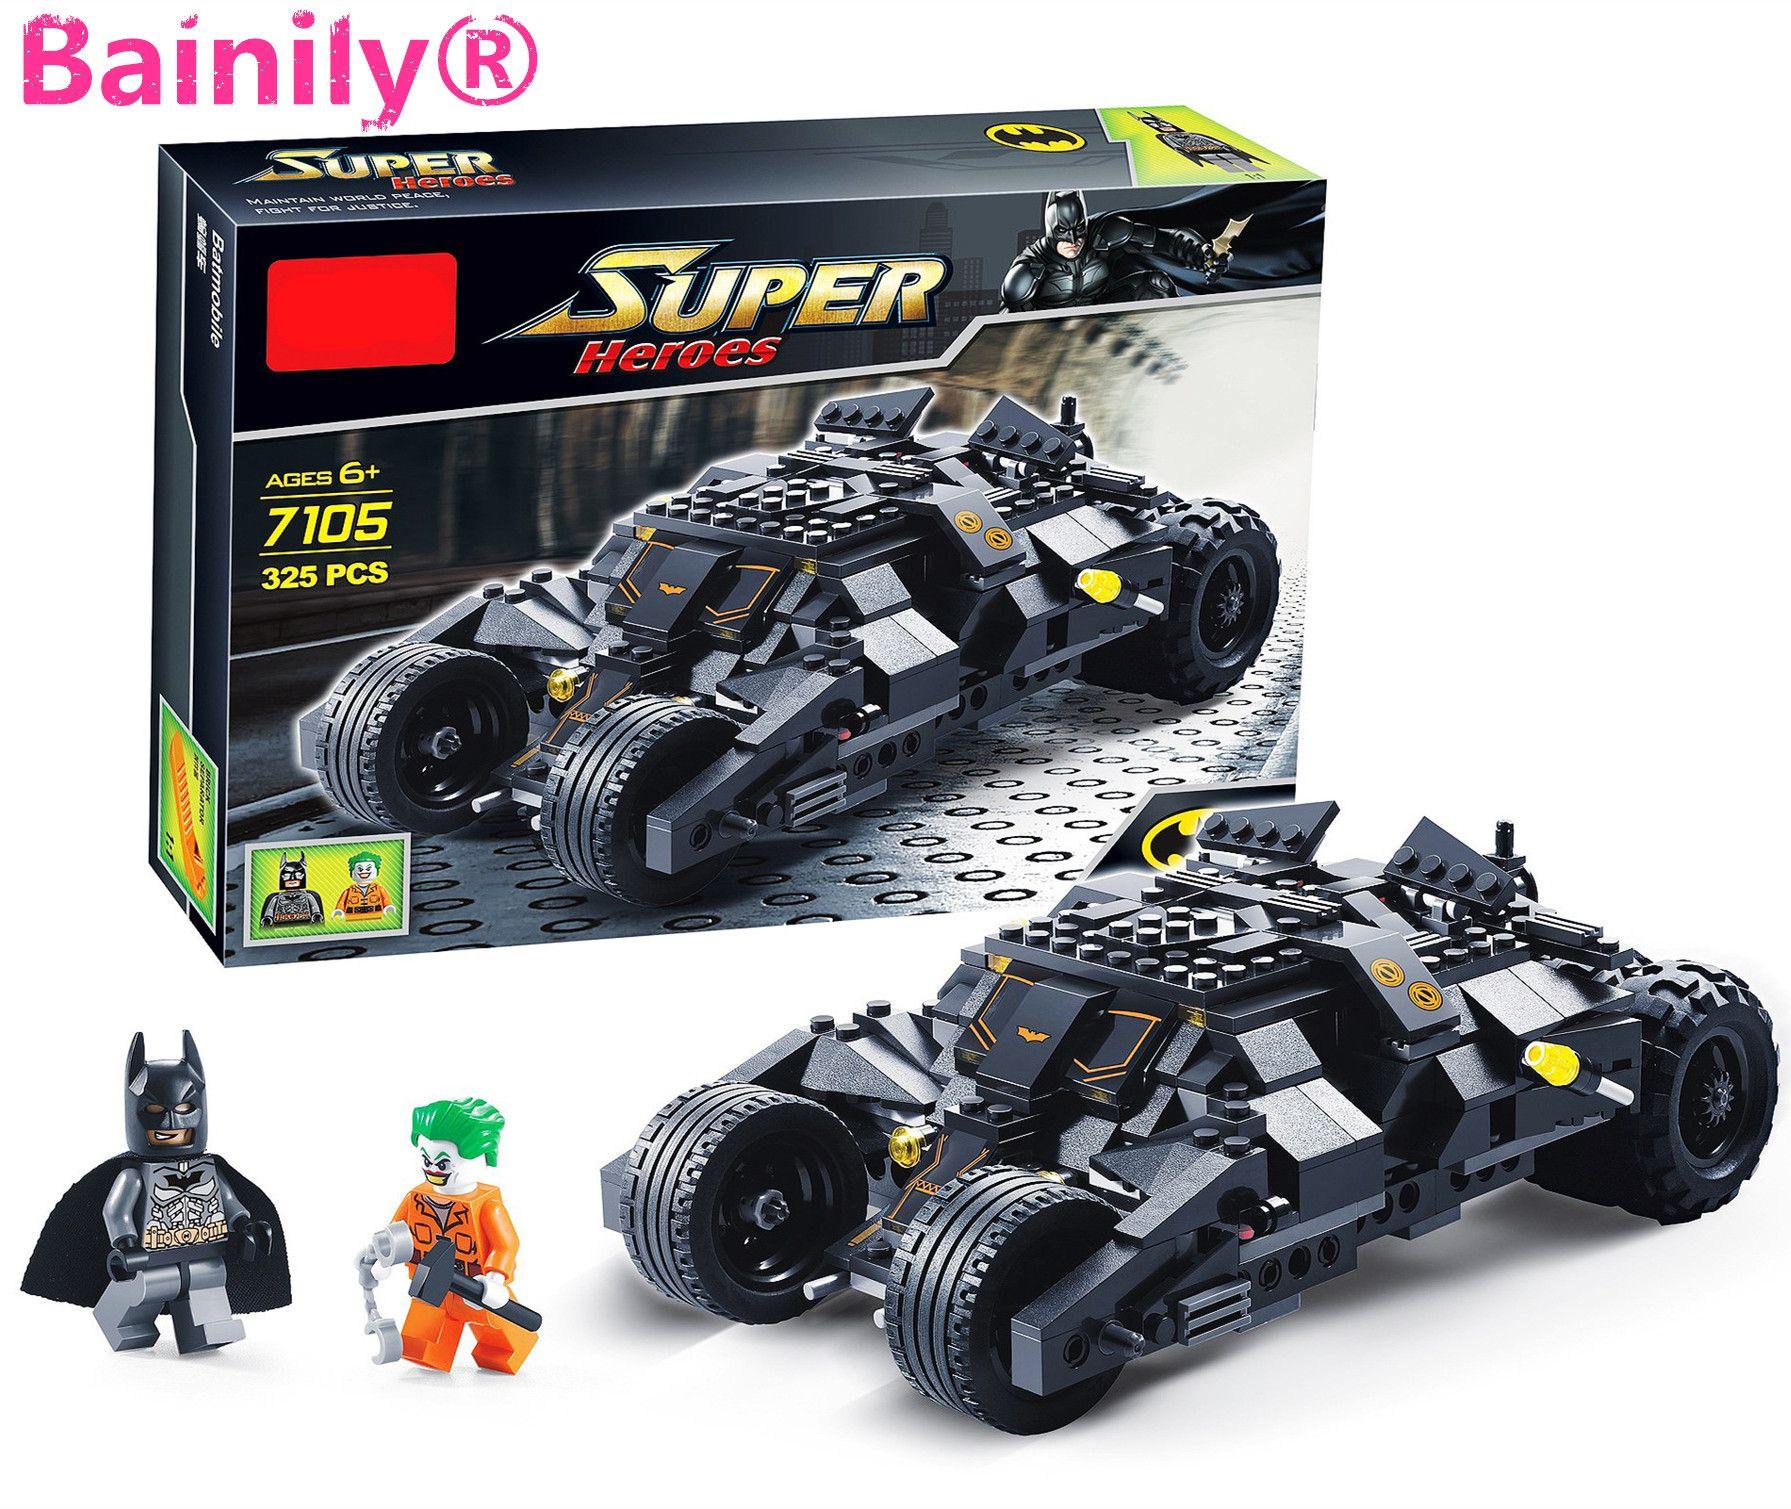 bainily super heroe batman race truck car model technic. Black Bedroom Furniture Sets. Home Design Ideas